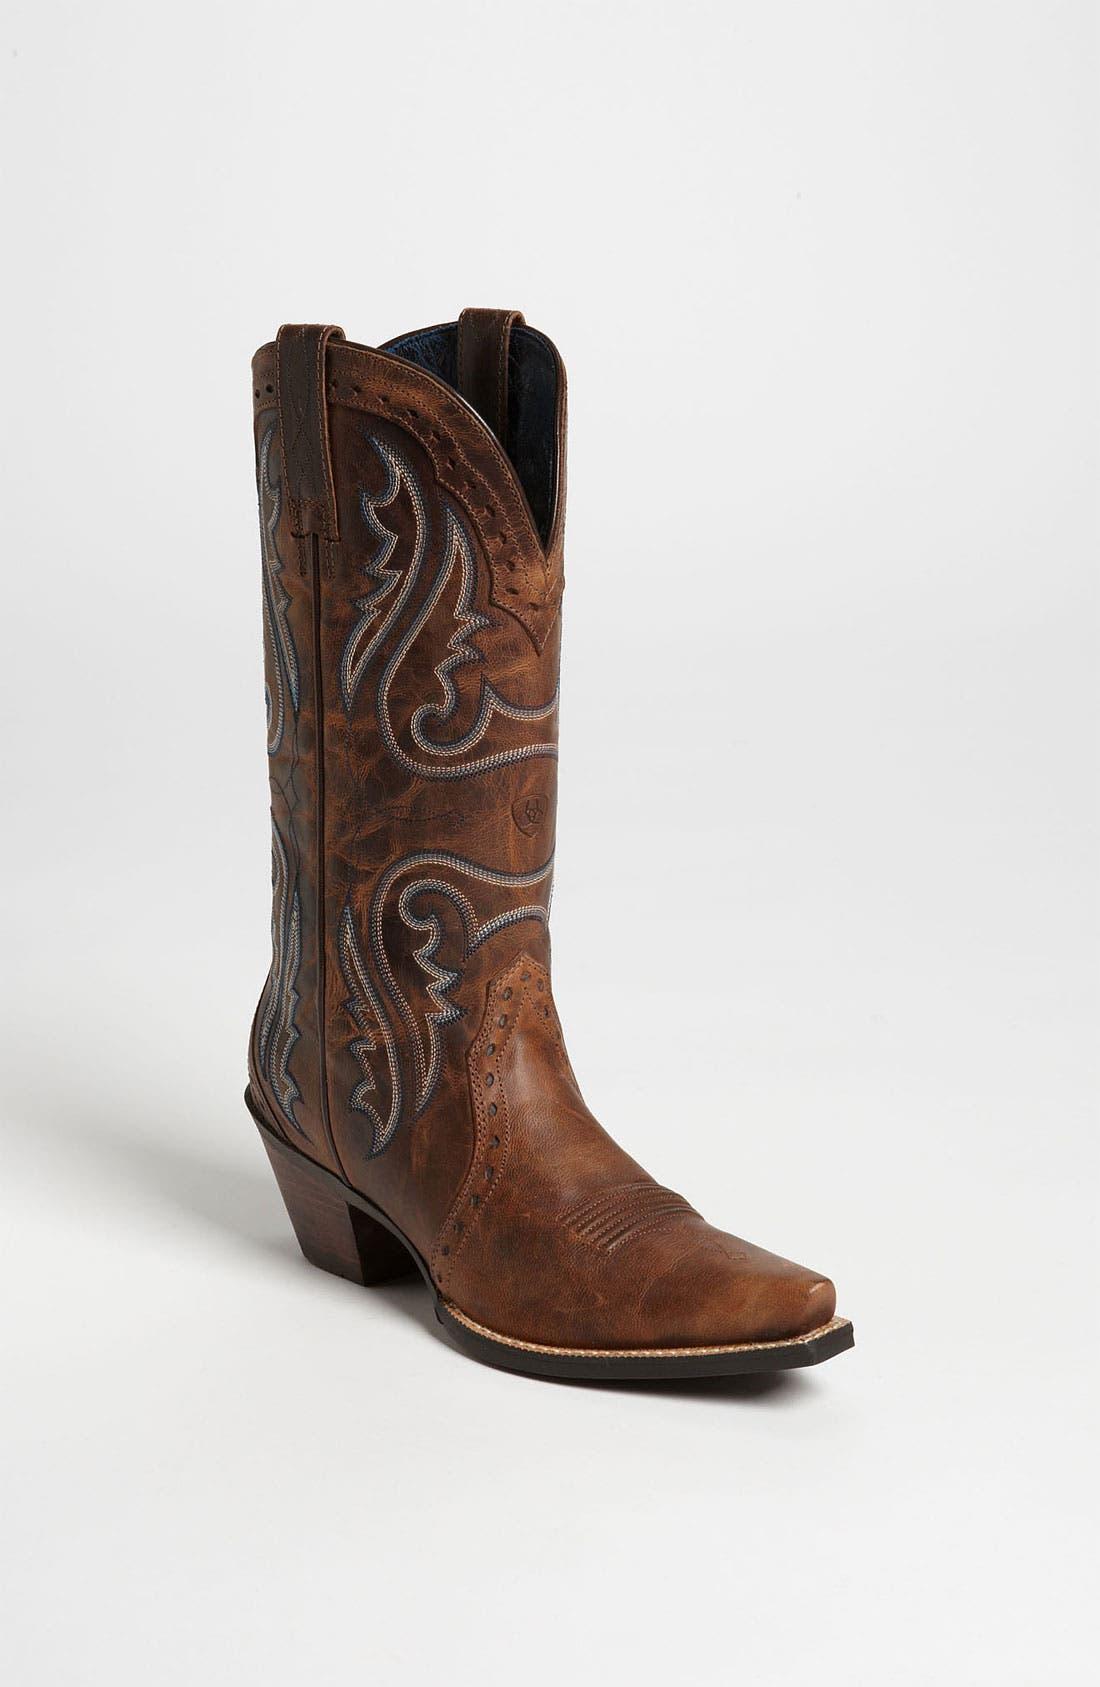 Alternate Image 1 Selected - Ariat 'Western Heritage X Toe' Boot